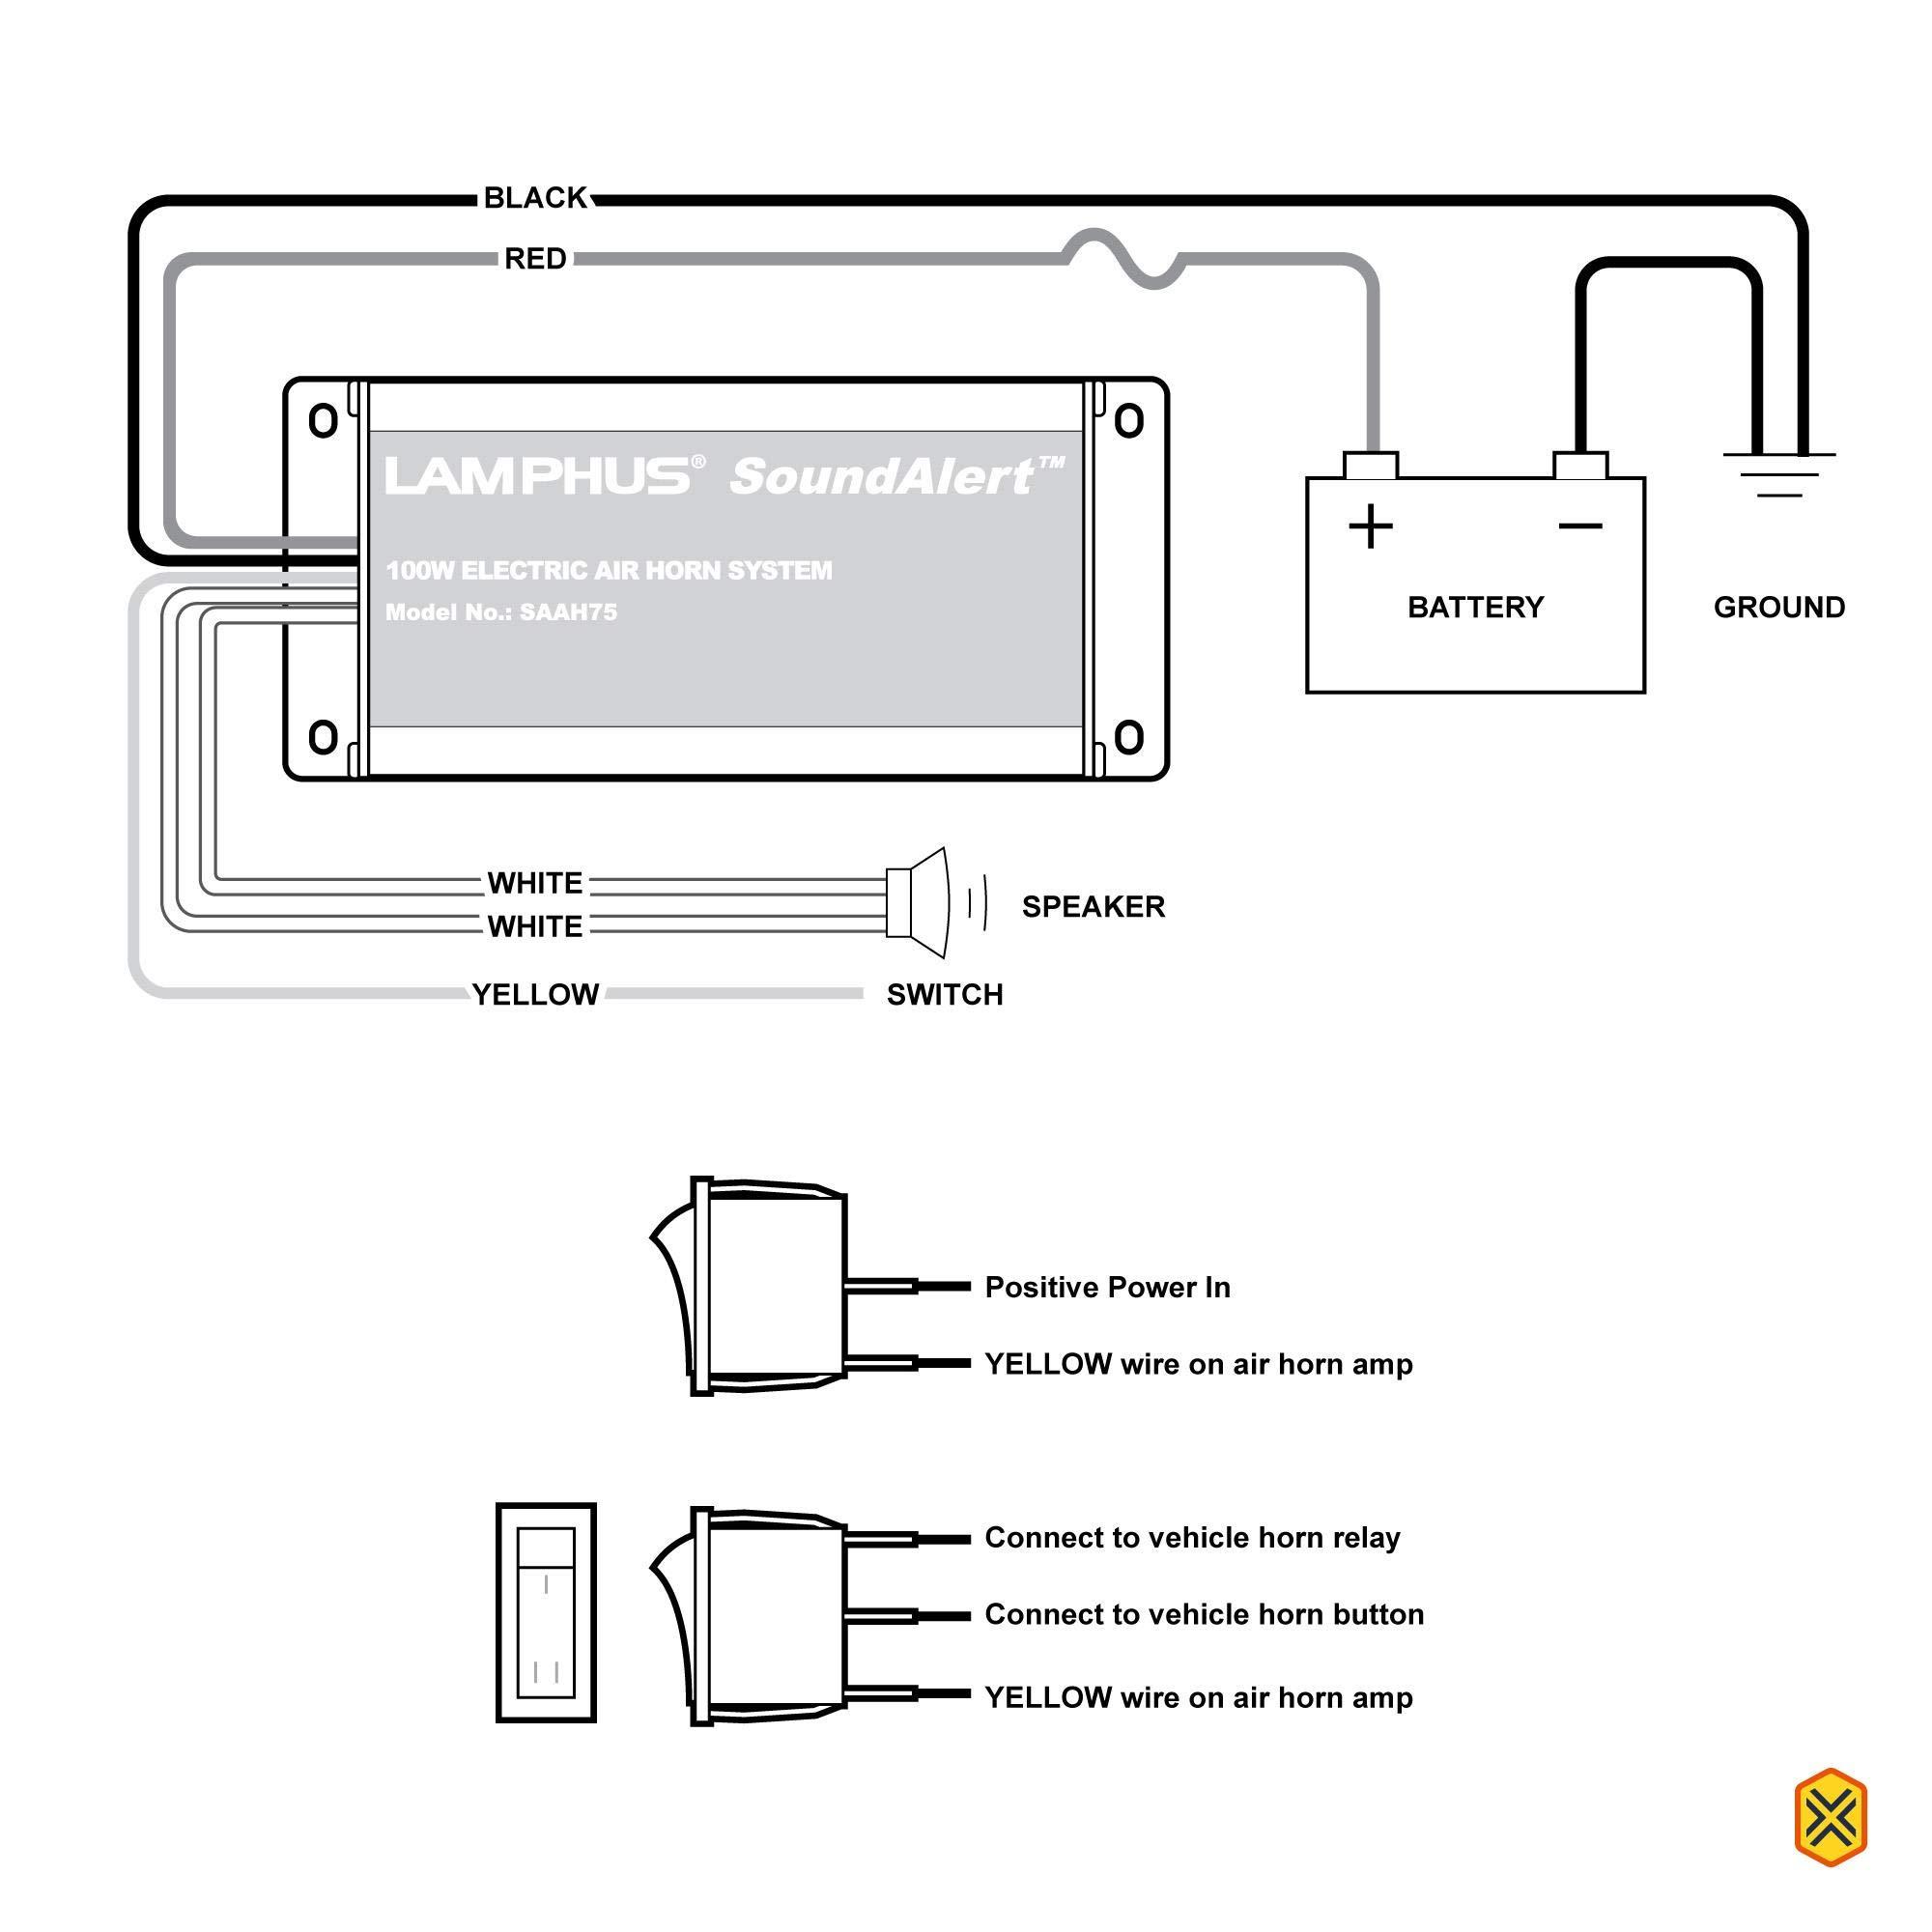 amazon.com: lamphus soundalert 12v 100w electric police air horn ... kleinn air horn wiring diagram train horn wiring diagram with relay amazon.com